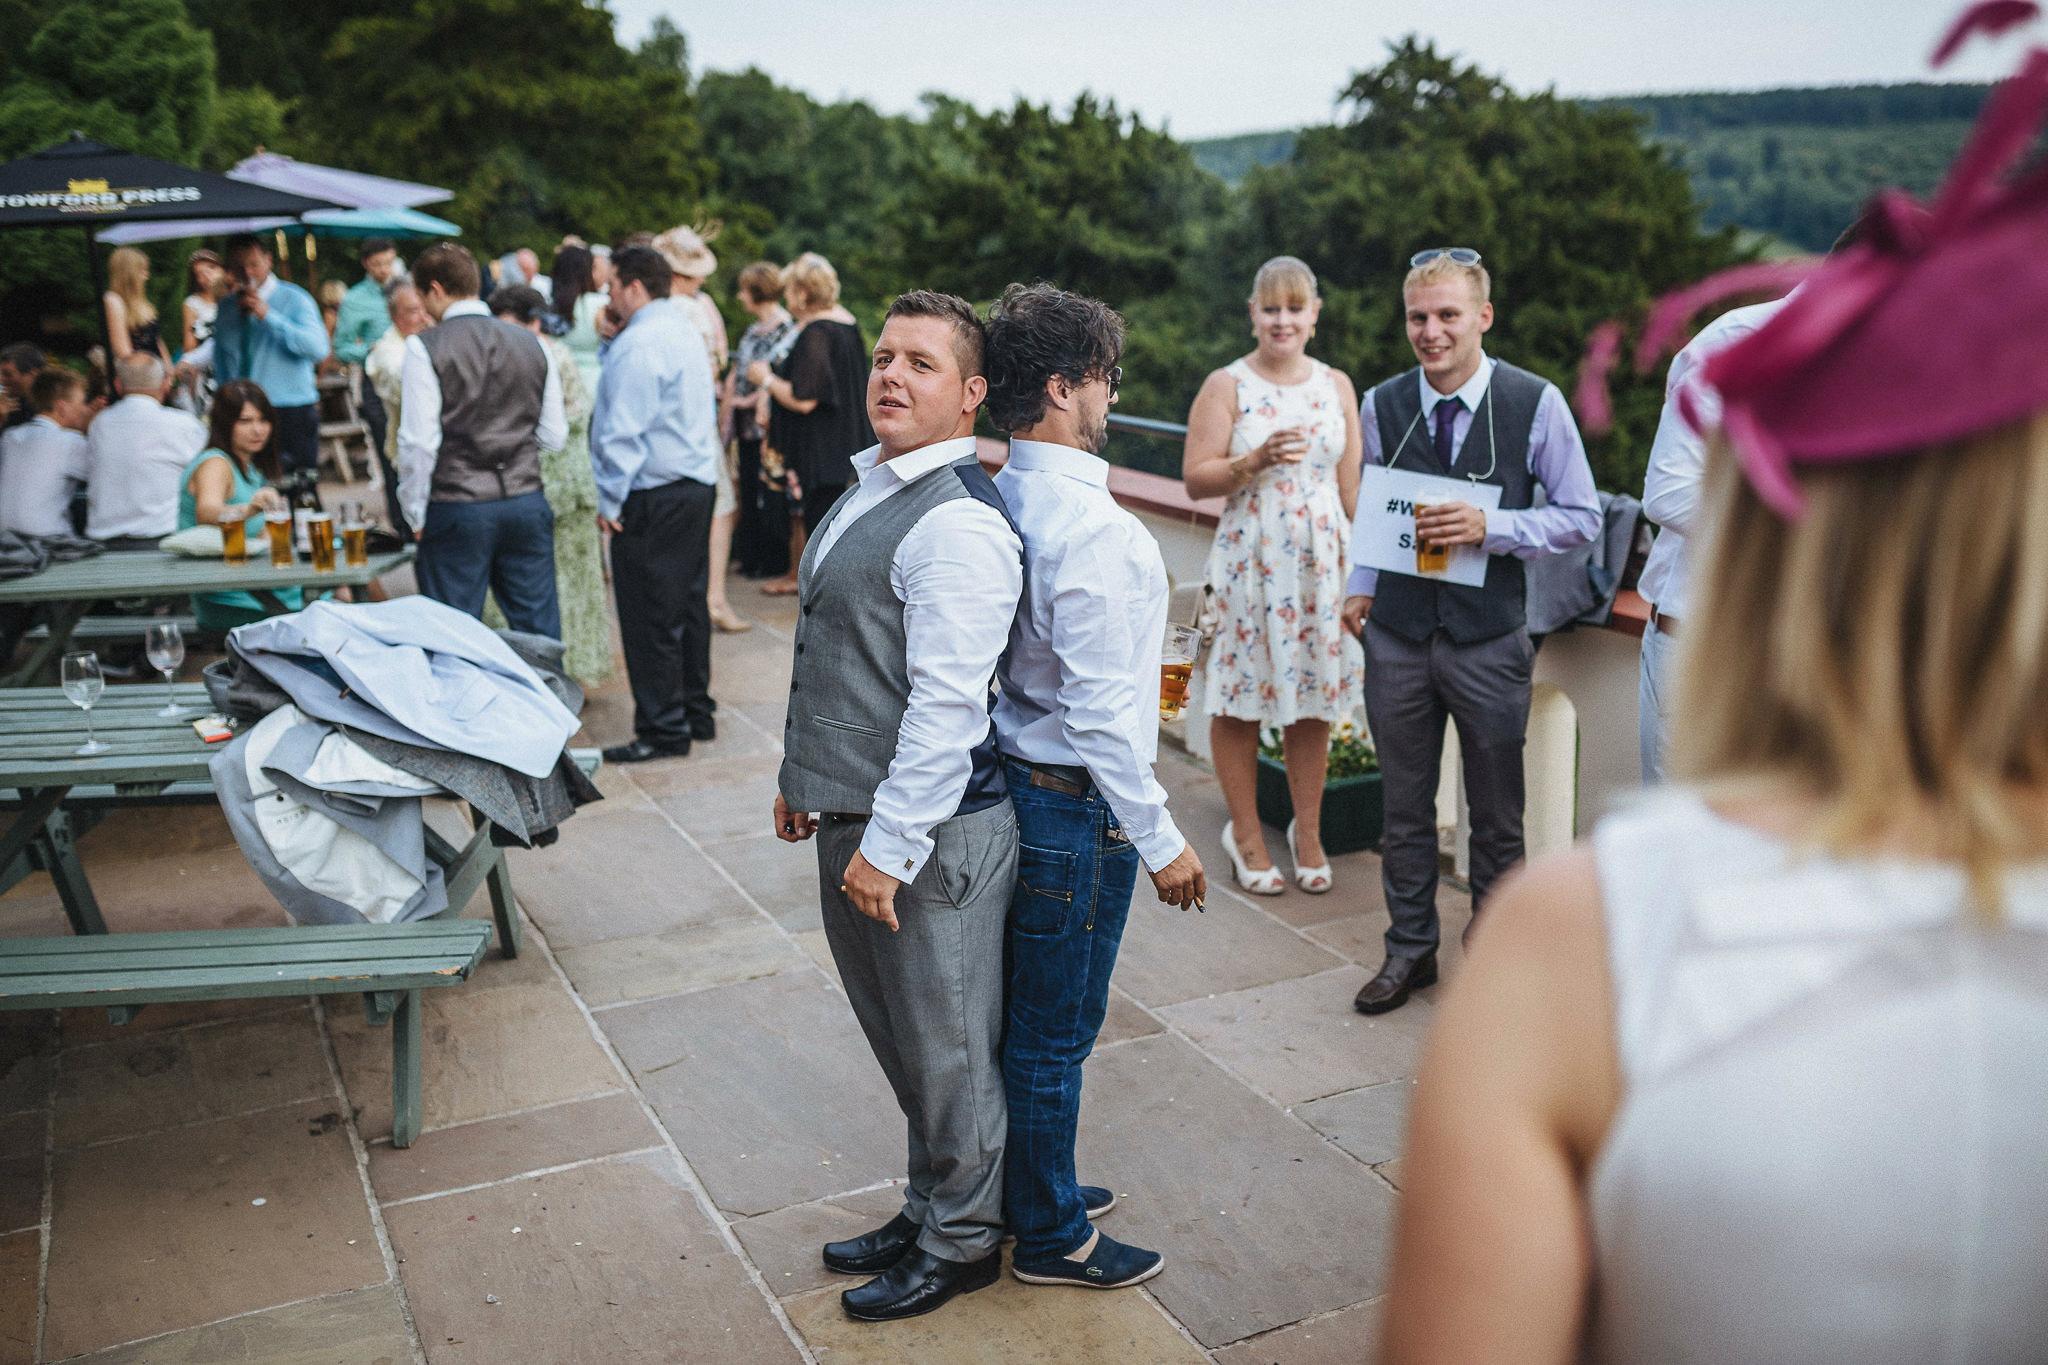 paul-marbrook-Caer-Llan-Wedding-Photographer-90085